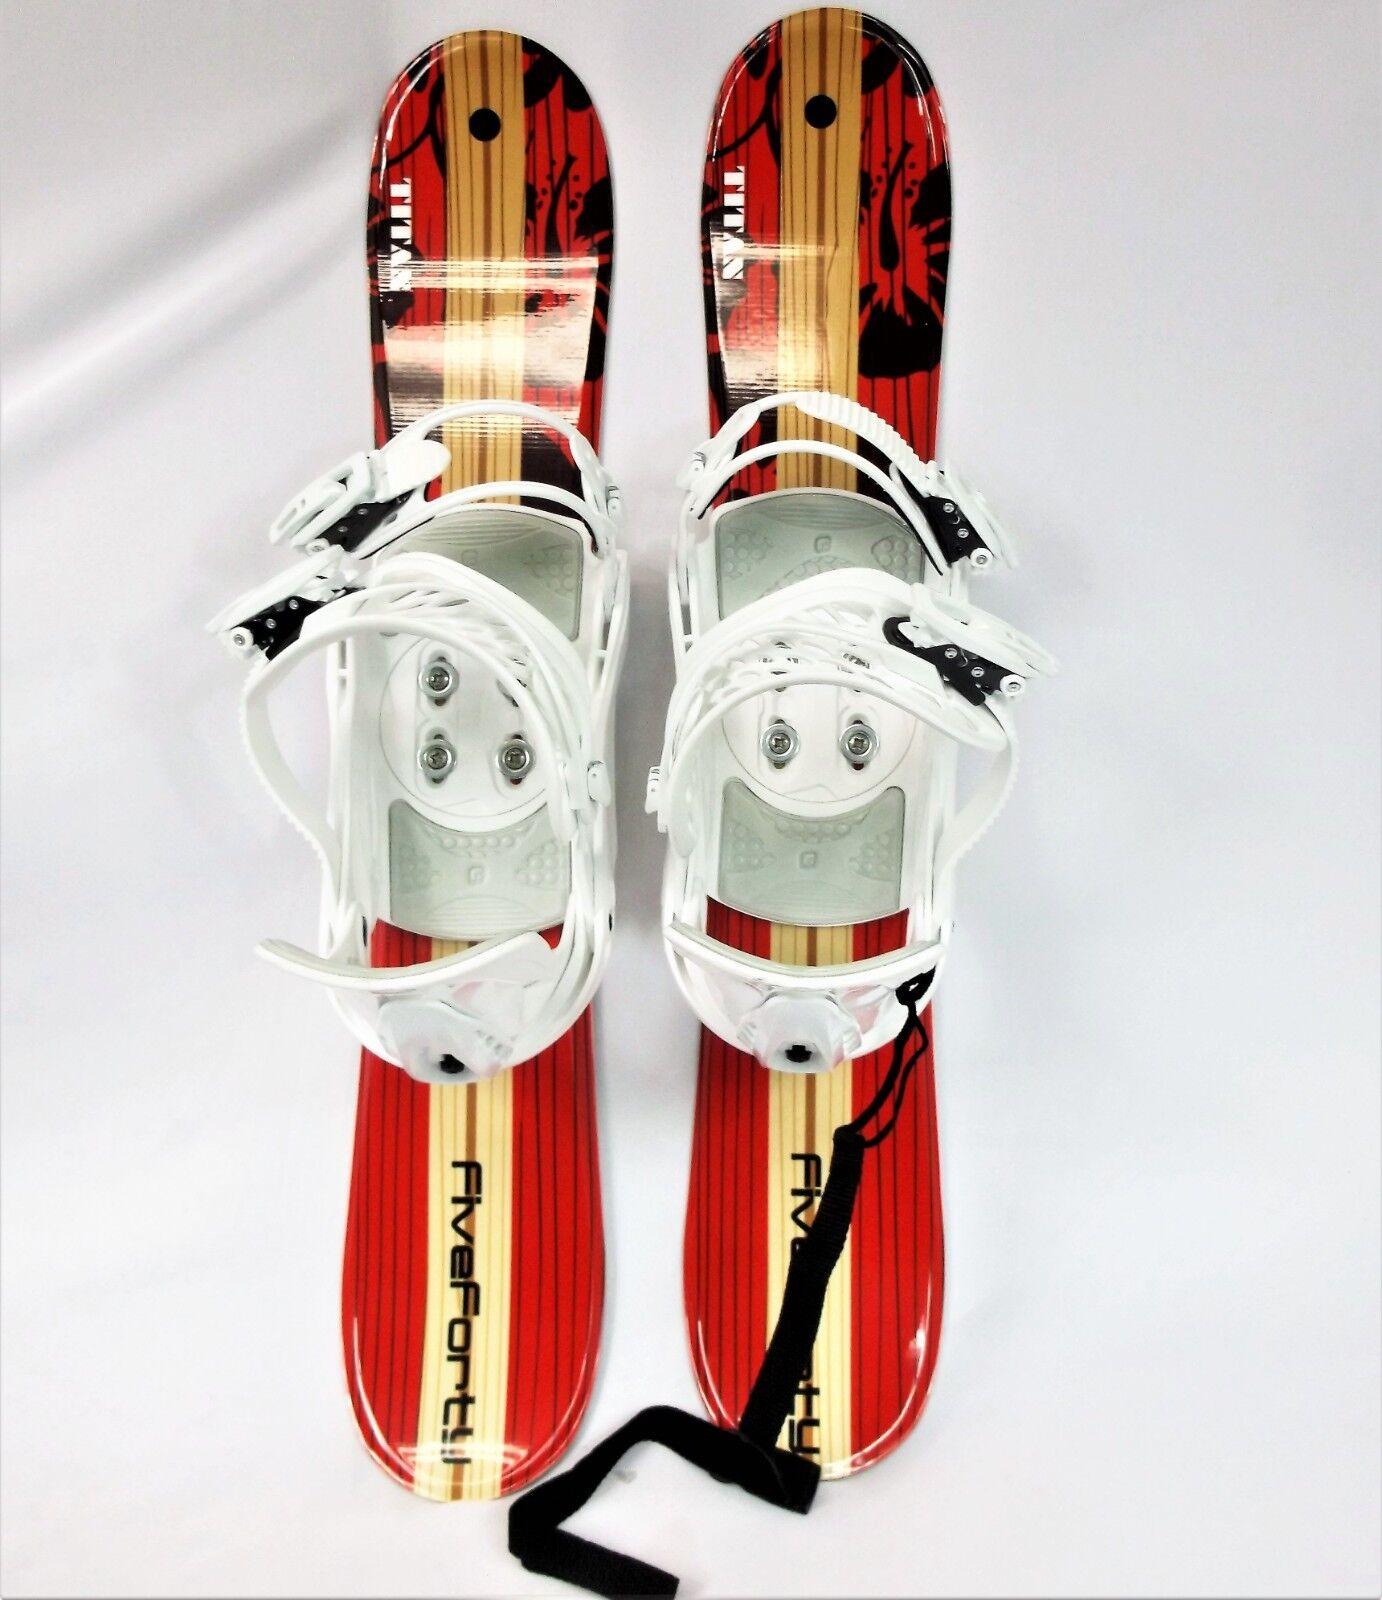 Snowblade & Binding, FiveForty 75cm,Titan WIDE, Ski Blade, FiveForty Binding